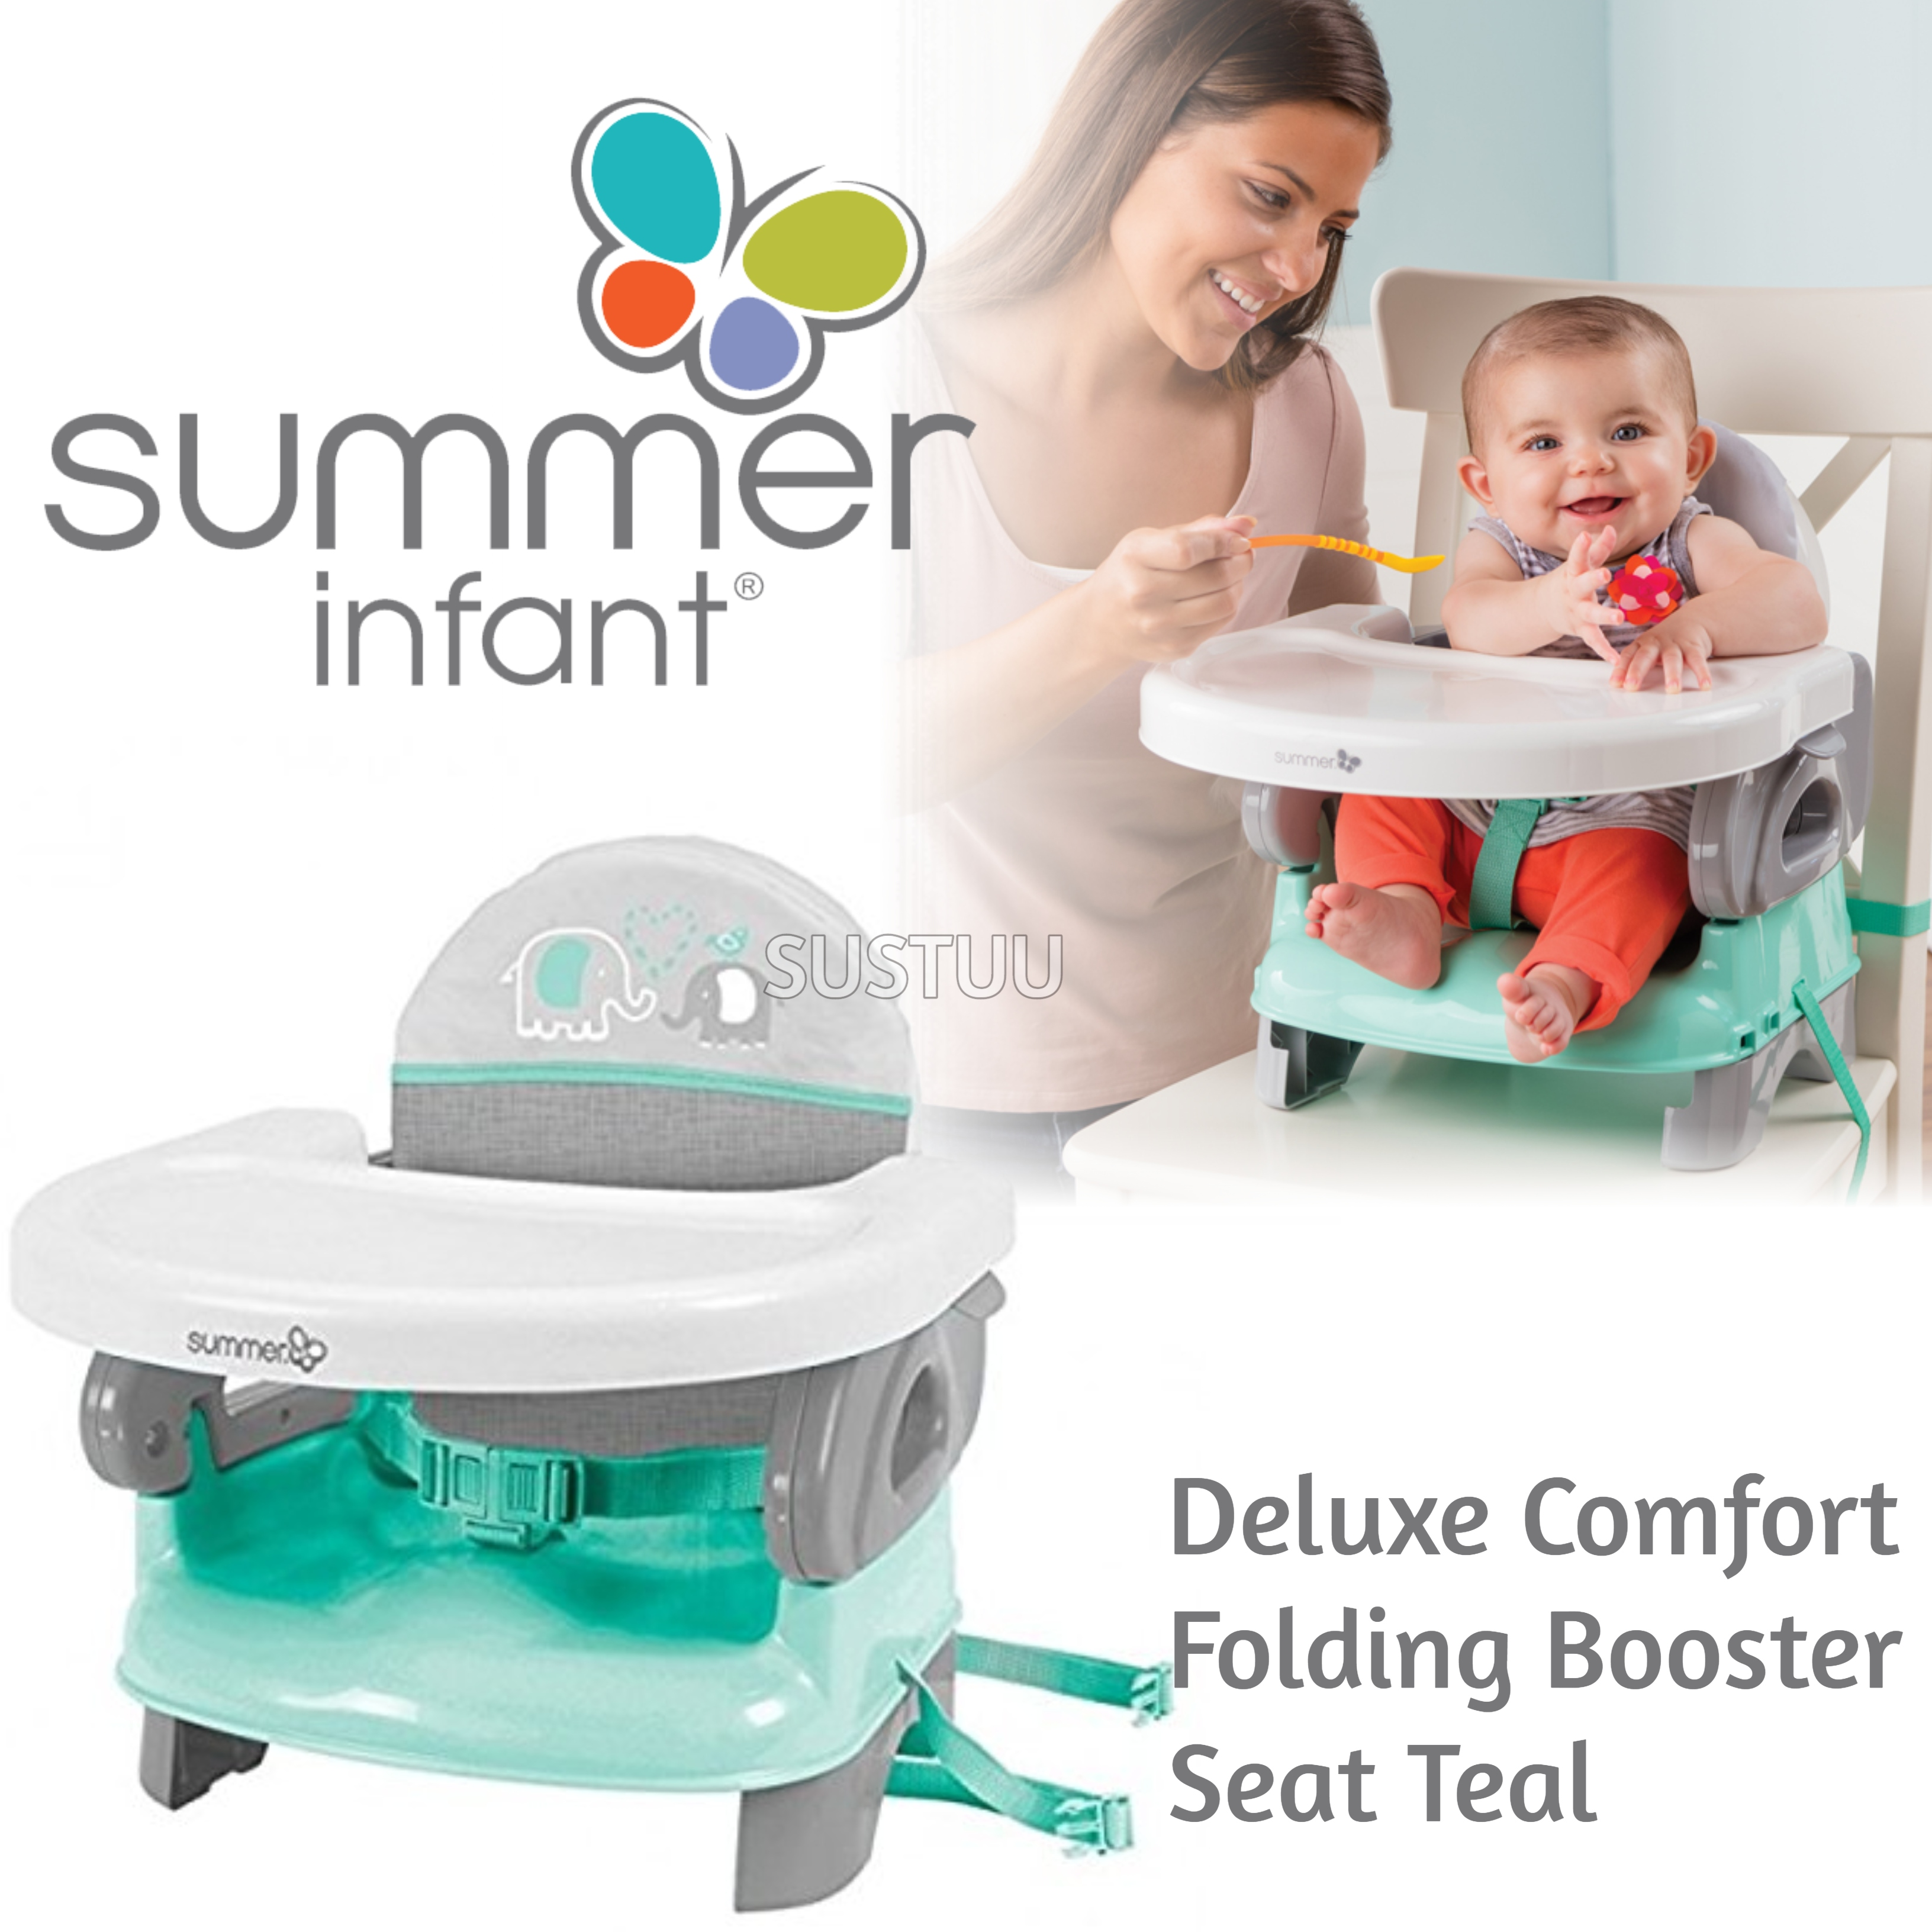 Summer Infant Deluxe Comfort Folding Booster Seal|Indoor Outdoor Fedding|Teal|